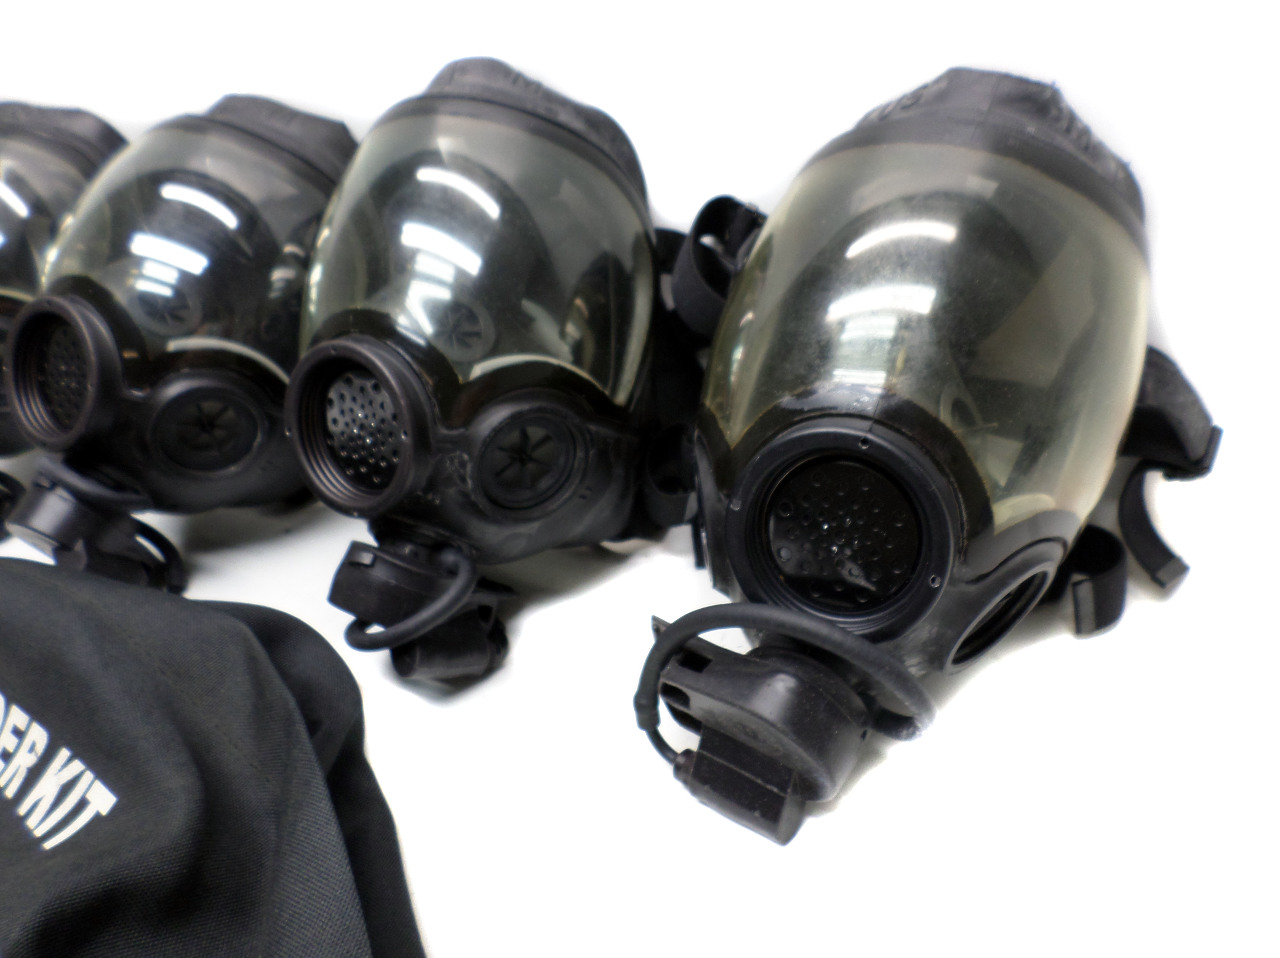 4 Msa Millennium Cbrn Respirator Riot Control Gas Mask